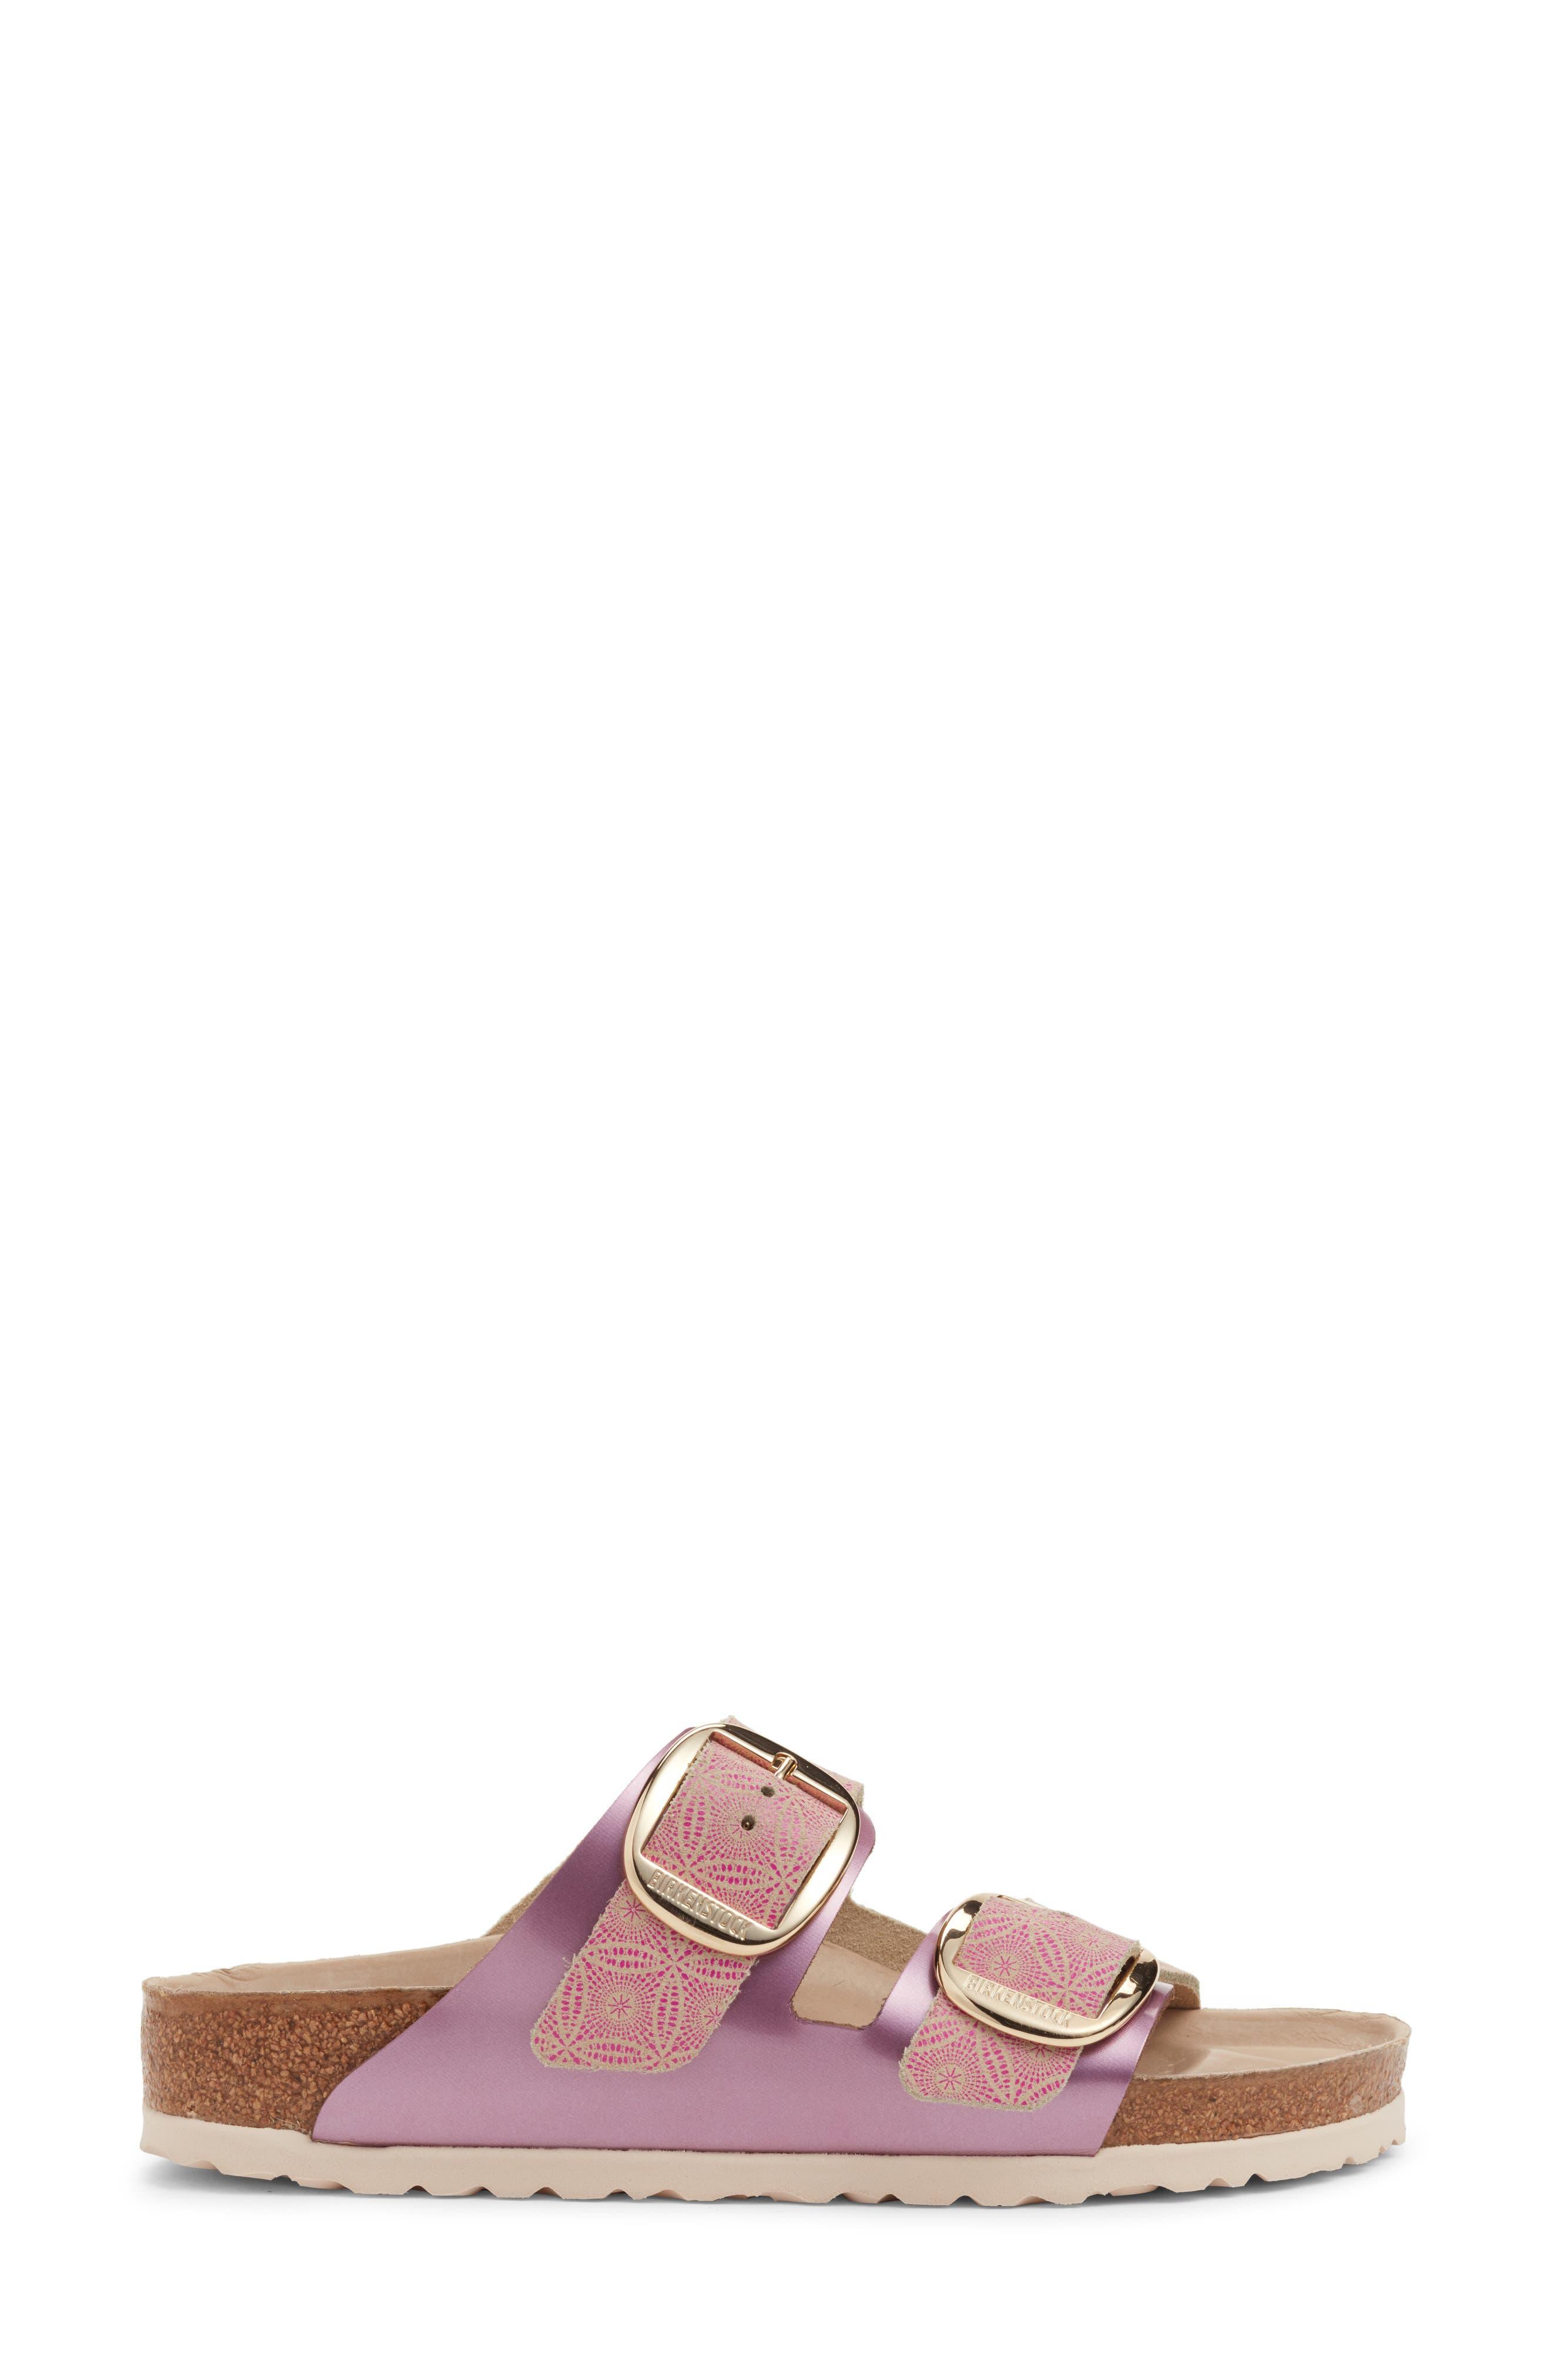 Arizona Big Buckle Slide Sandal,                             Alternate thumbnail 3, color,                             Ceramic Rose Leather